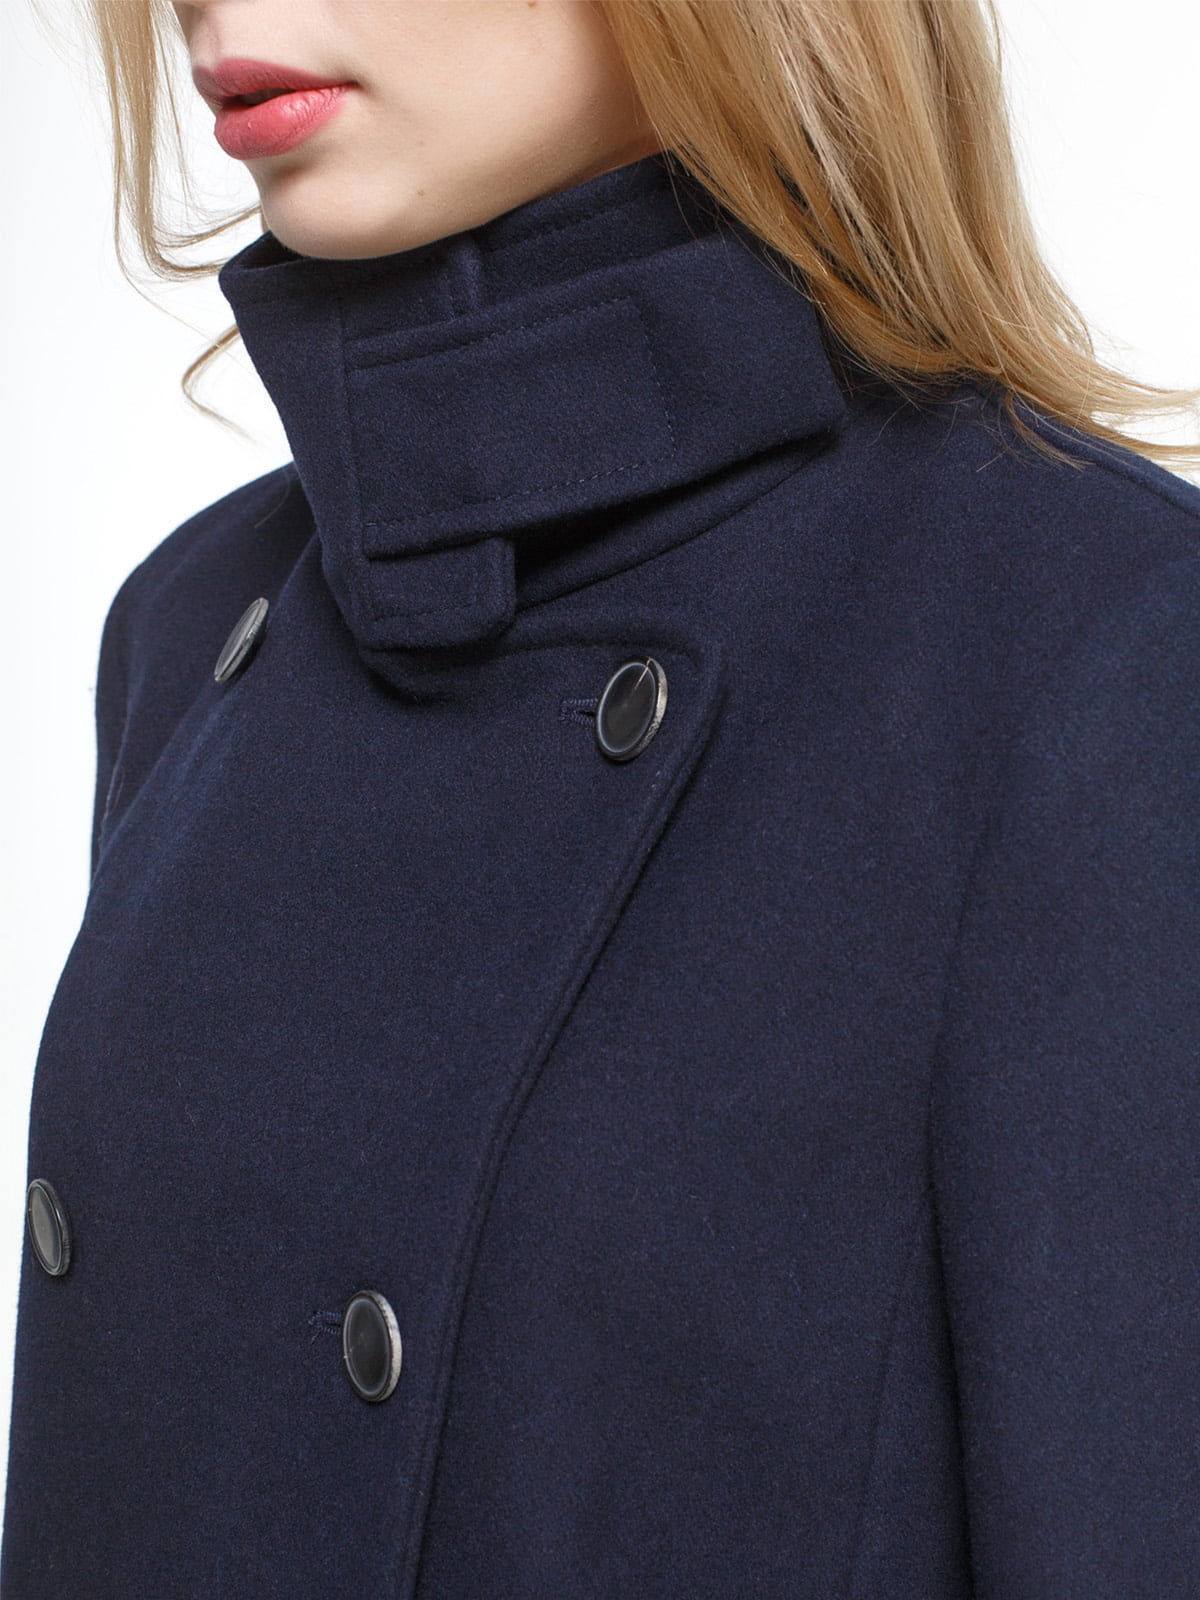 Пальто синее | 4790549 | фото 4